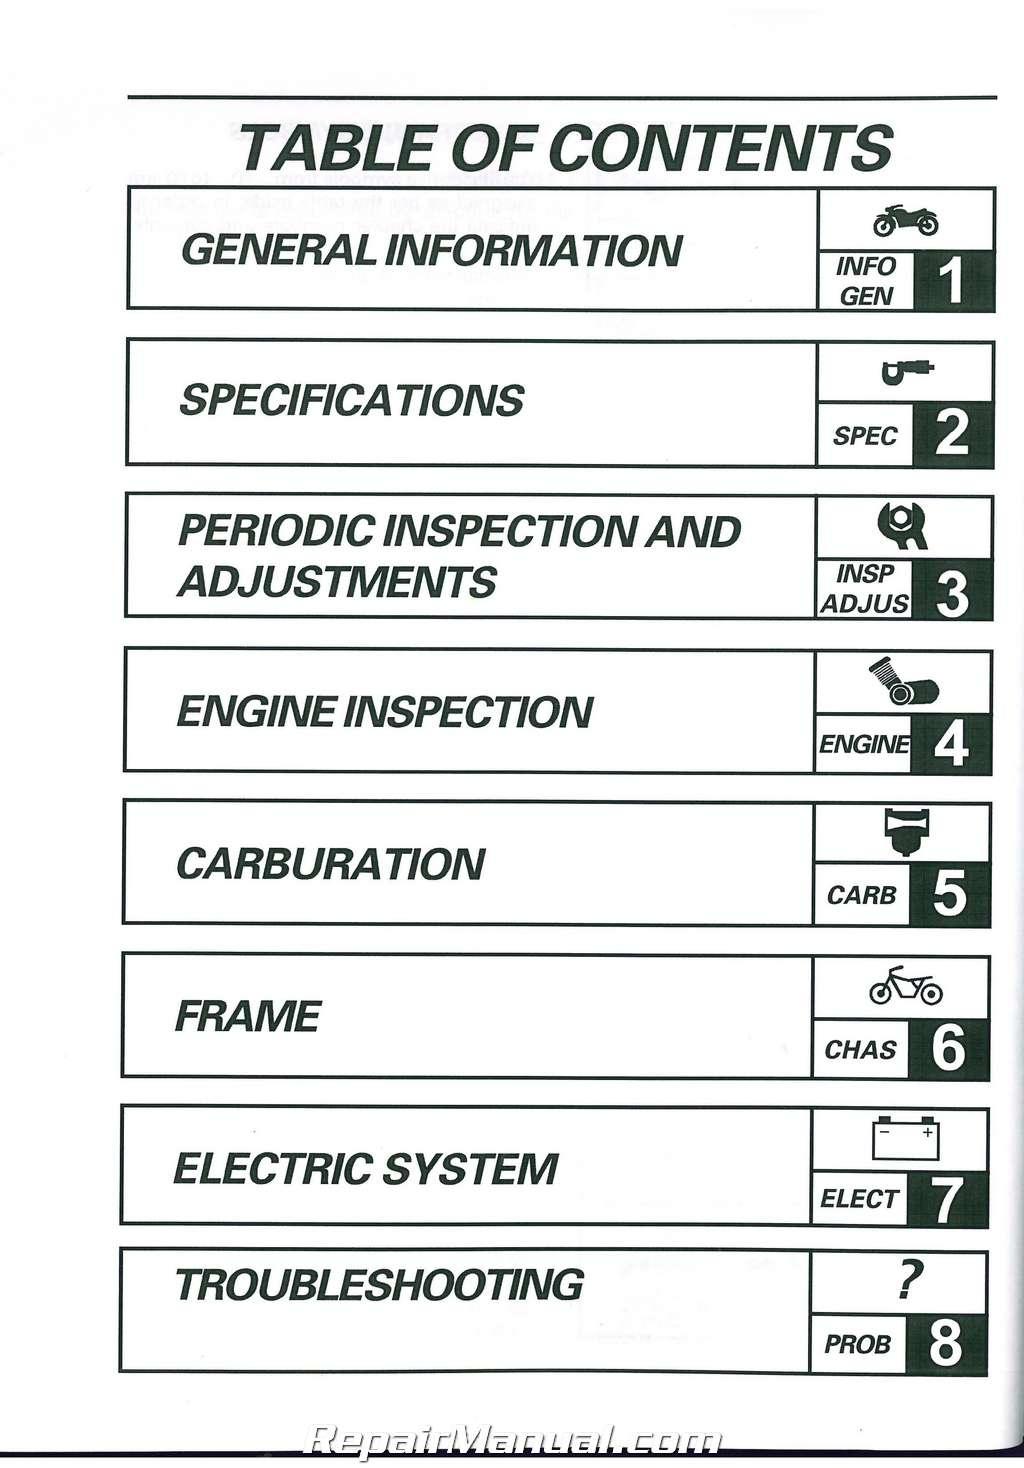 yamaha ttr230 motorcycle service manual 2005 2009 2011 2018 rh repairmanual com 2005 Yamaha TTR 230 2015 Yamaha TTR 230